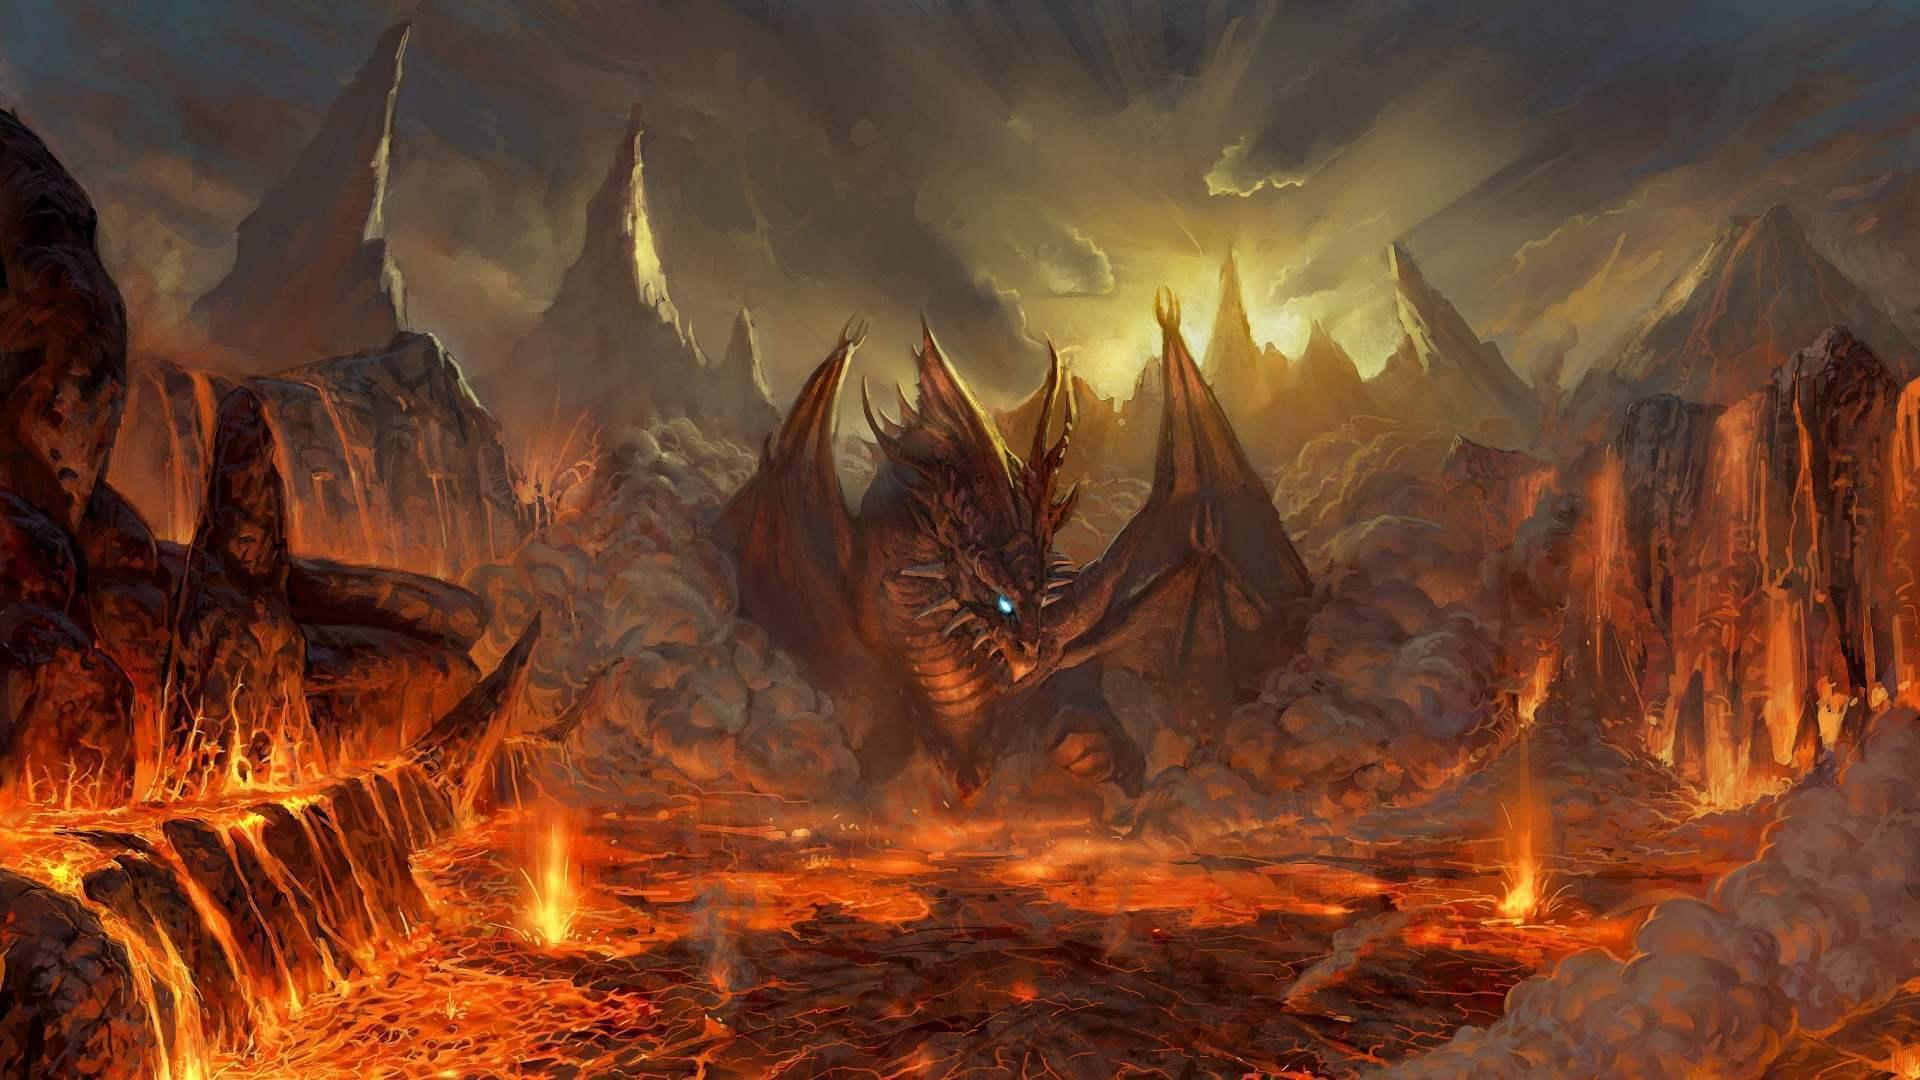 74 Fantasy Dragon Wallpaper On Wallpapersafari